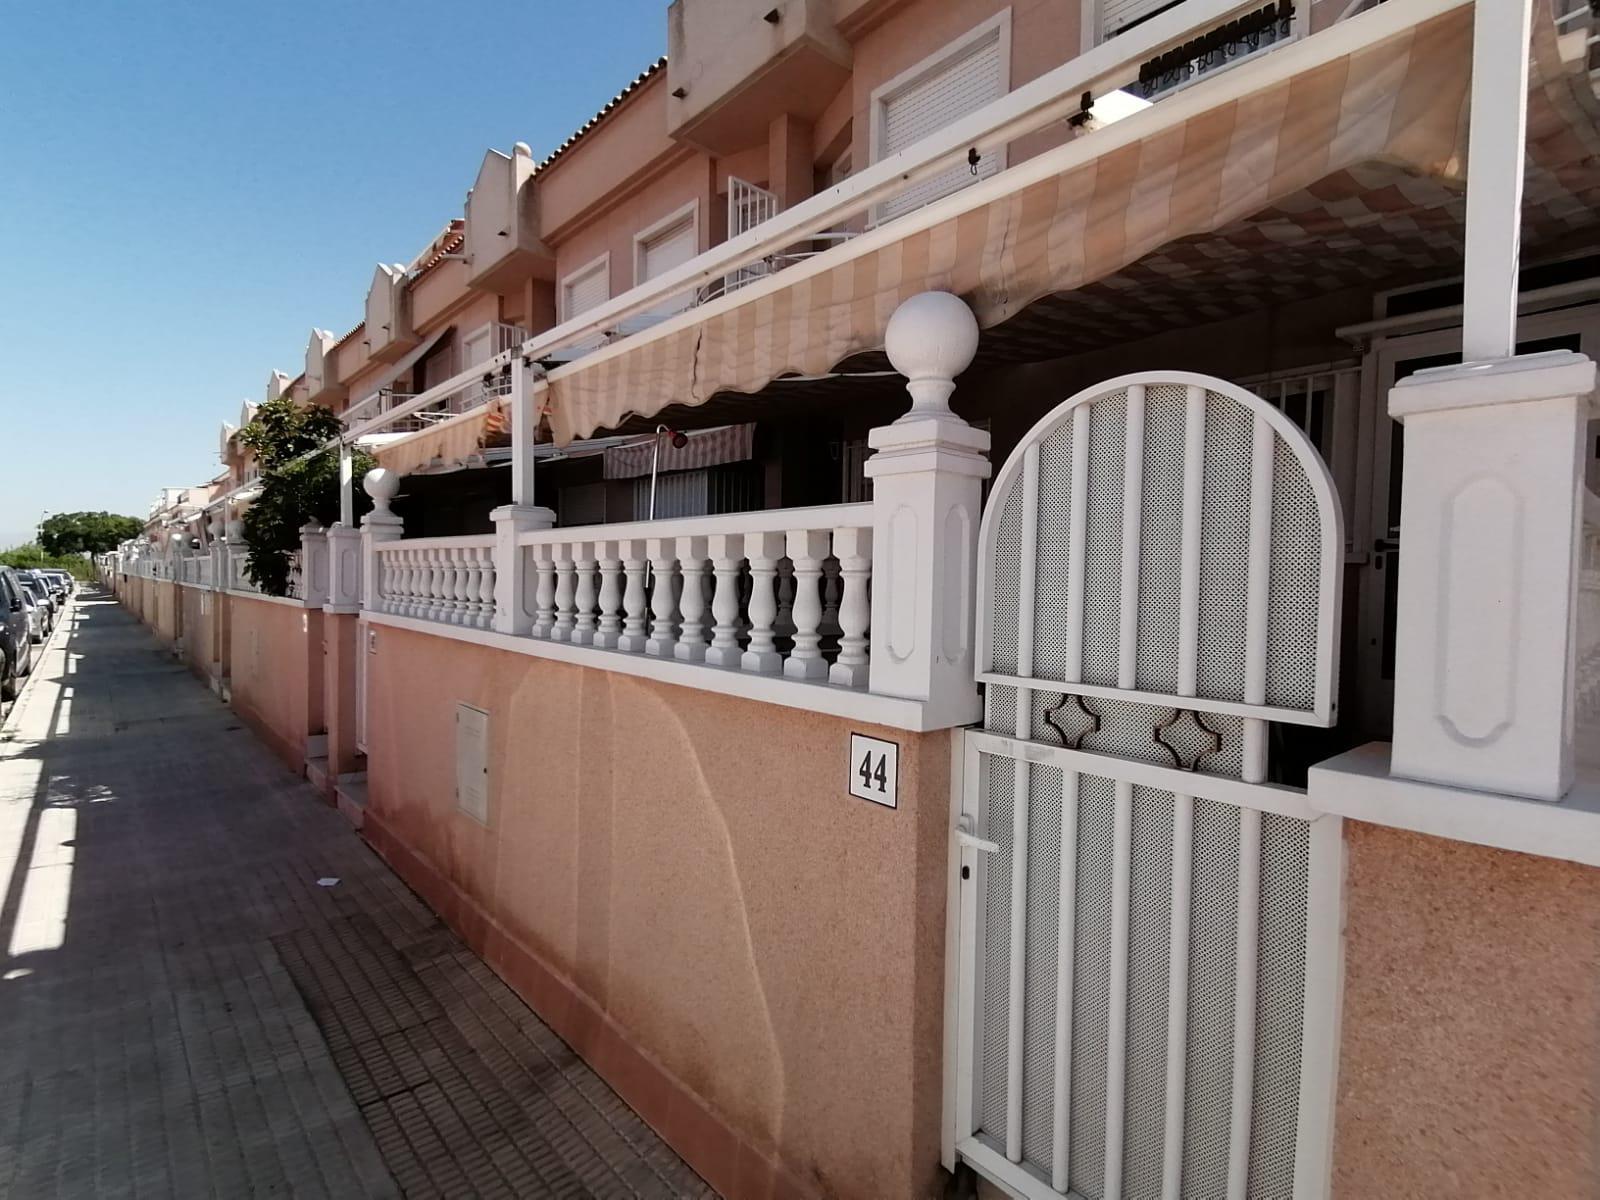 Imagen 3 Casa Adosada en venta en Santa Pola / Playa lisa-Tamarit